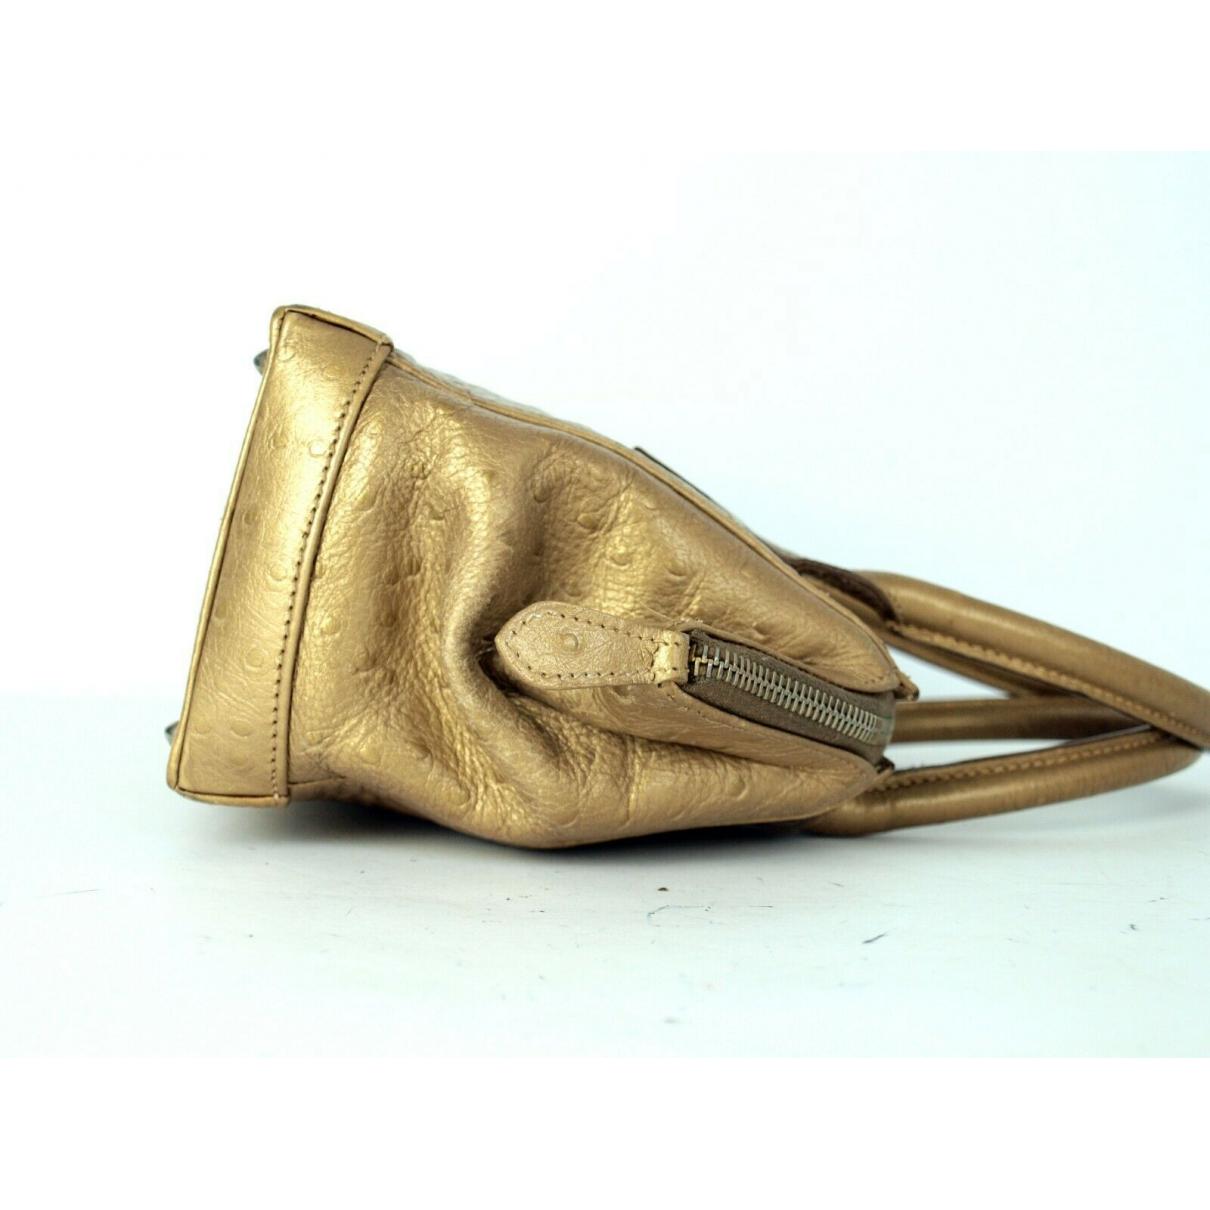 Fendi - Sac a main   pour femme en cuir - dore